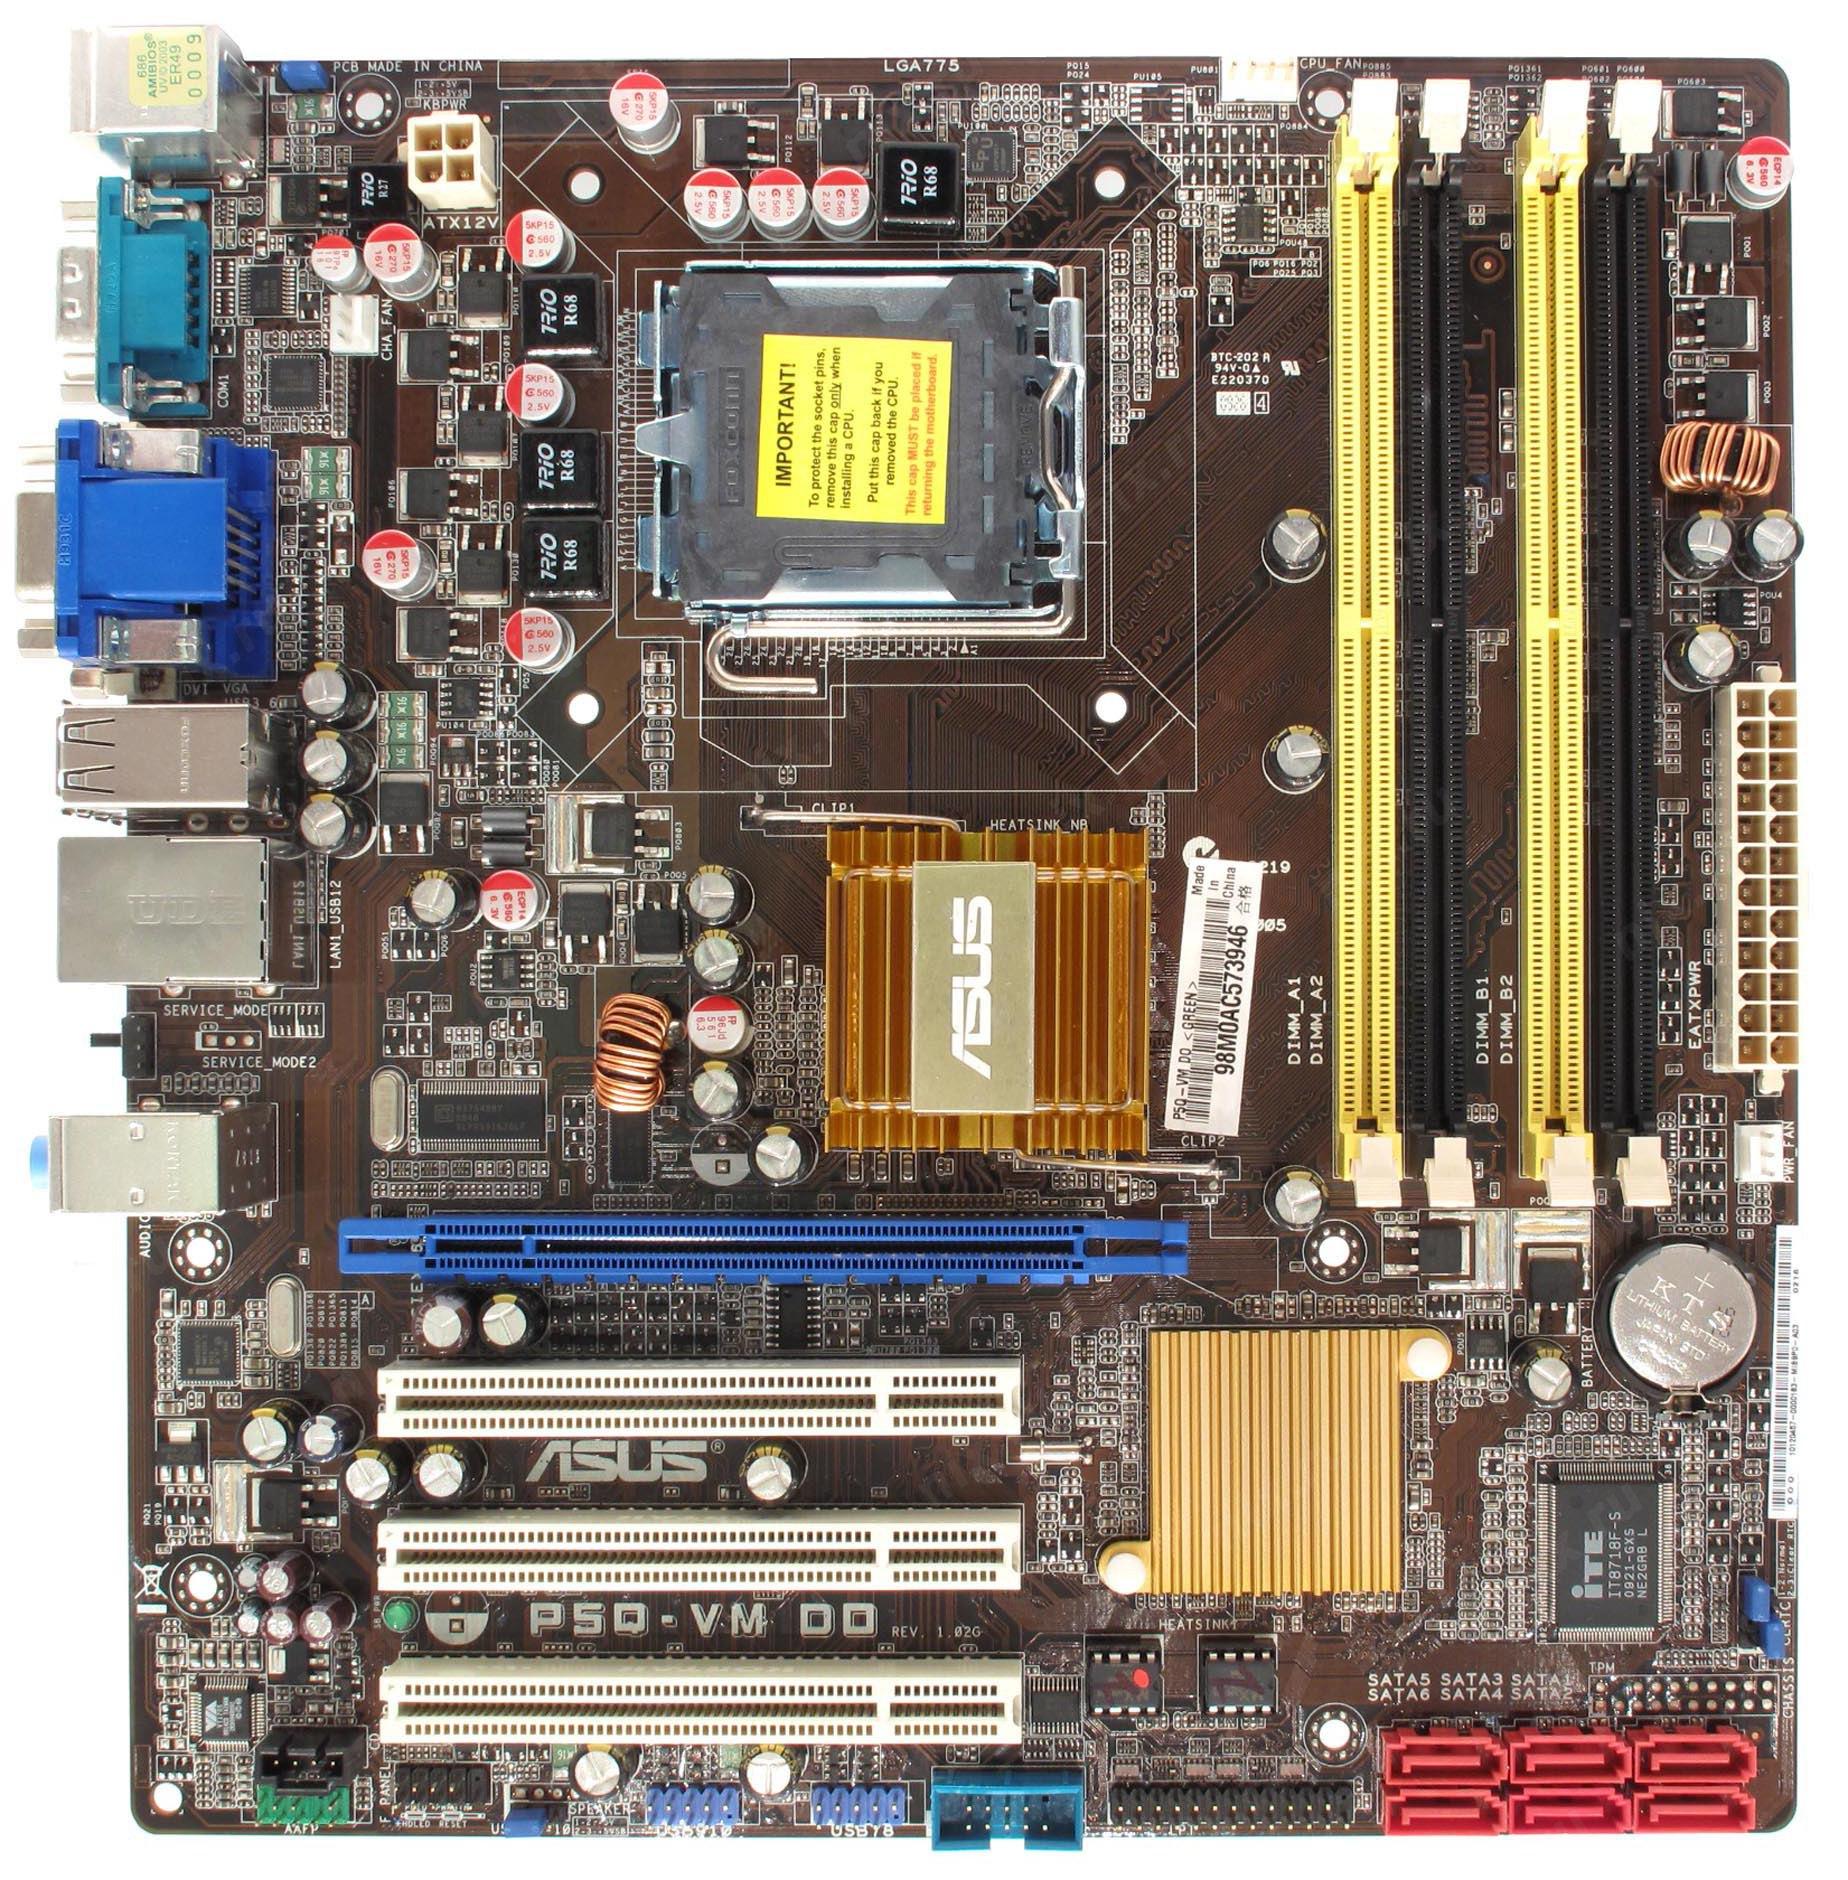 Asus P5Q-VM DO Intel VGA Driver for PC